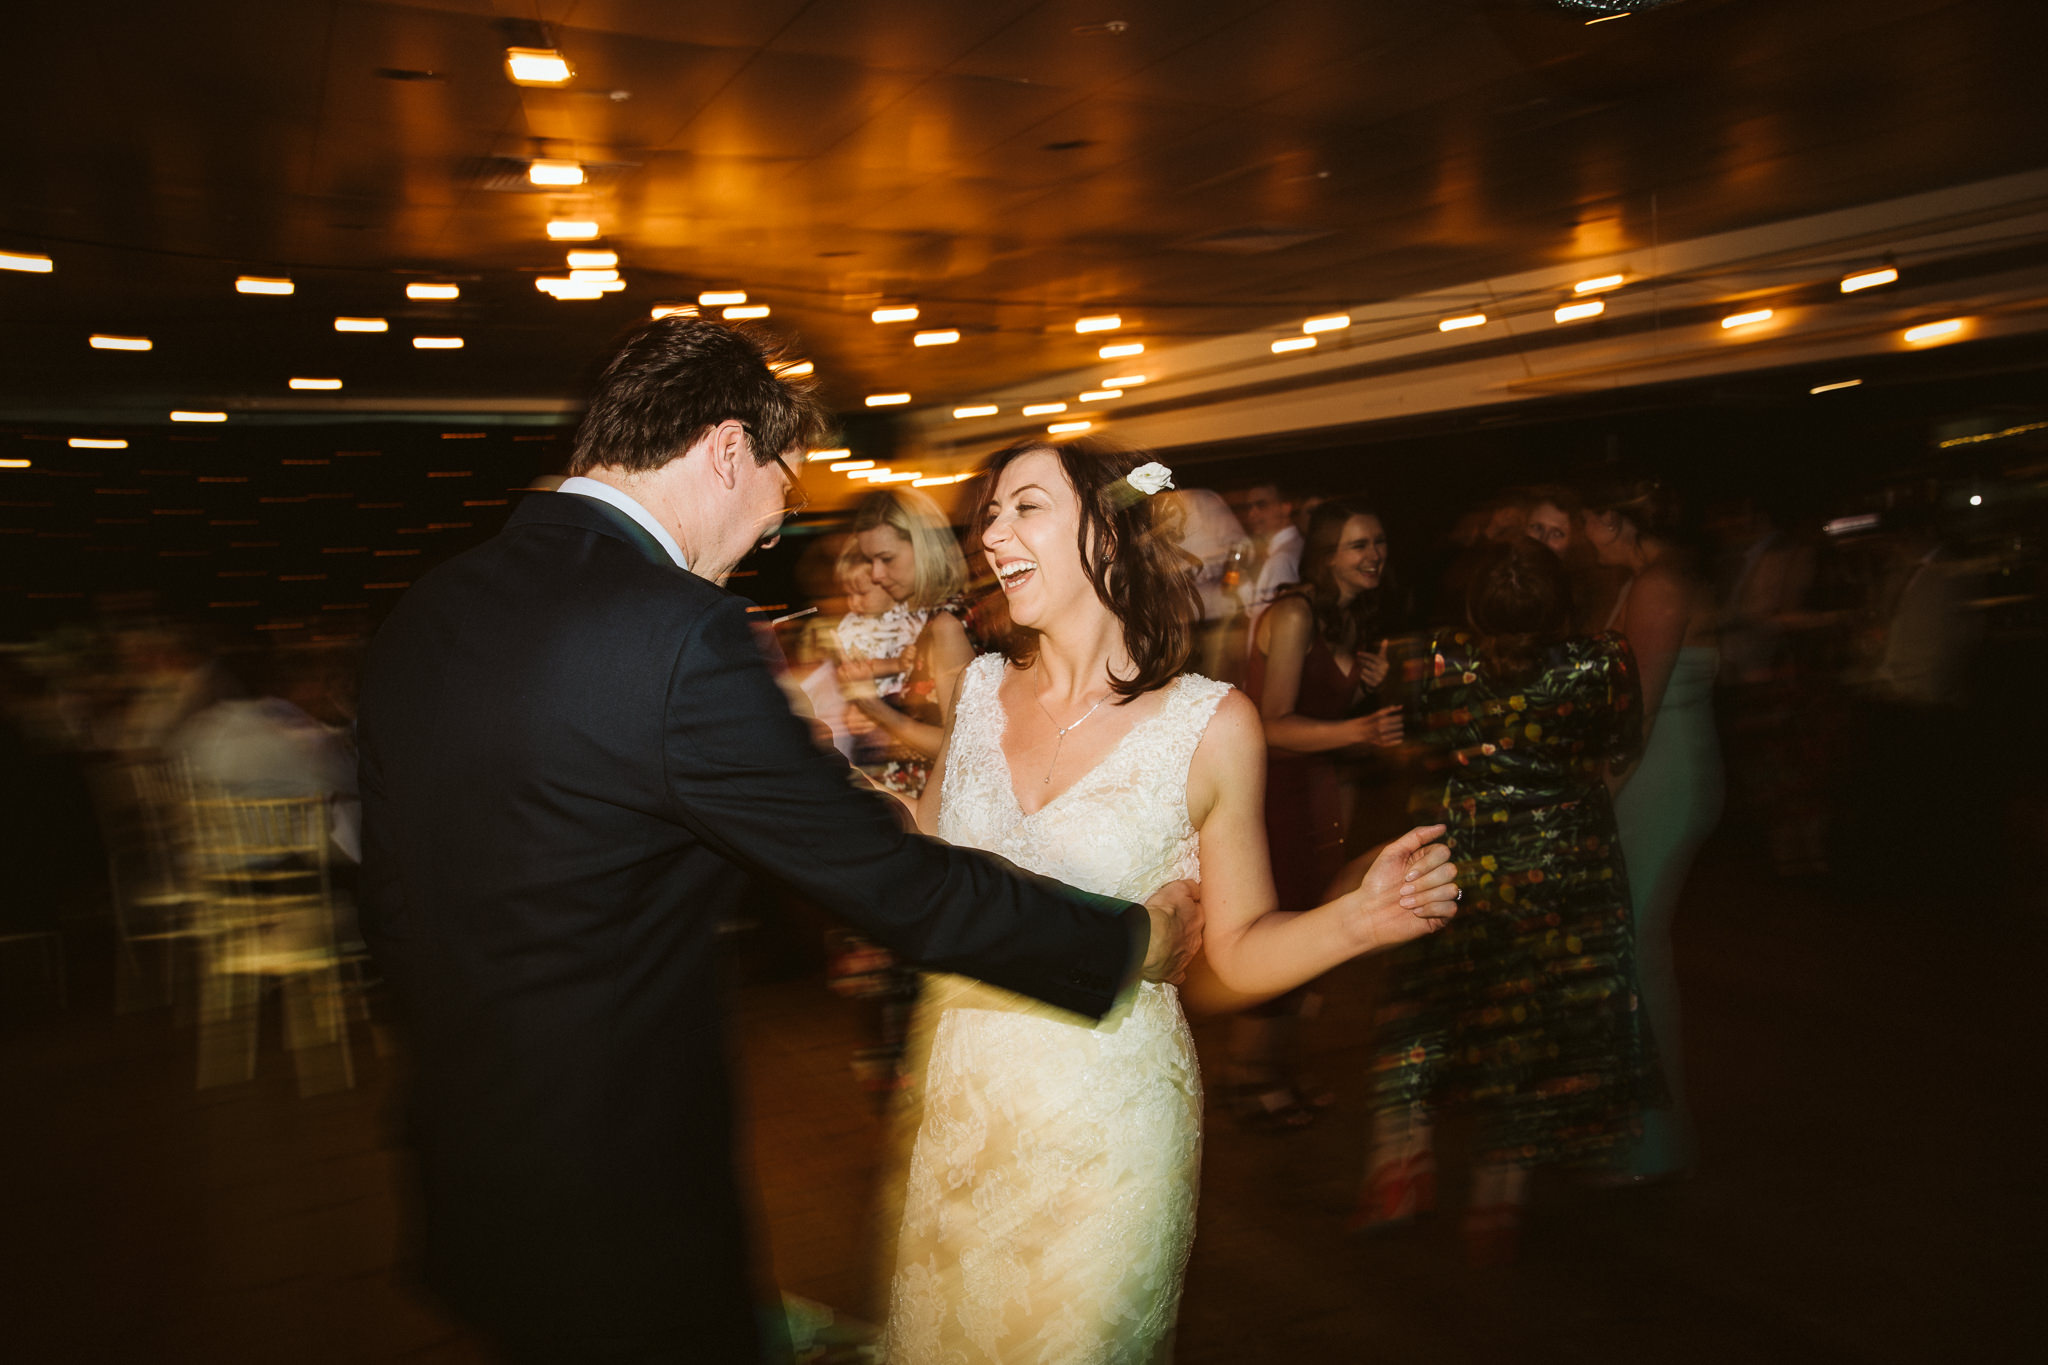 baltic-wedding-margarita-hope (120).jpg